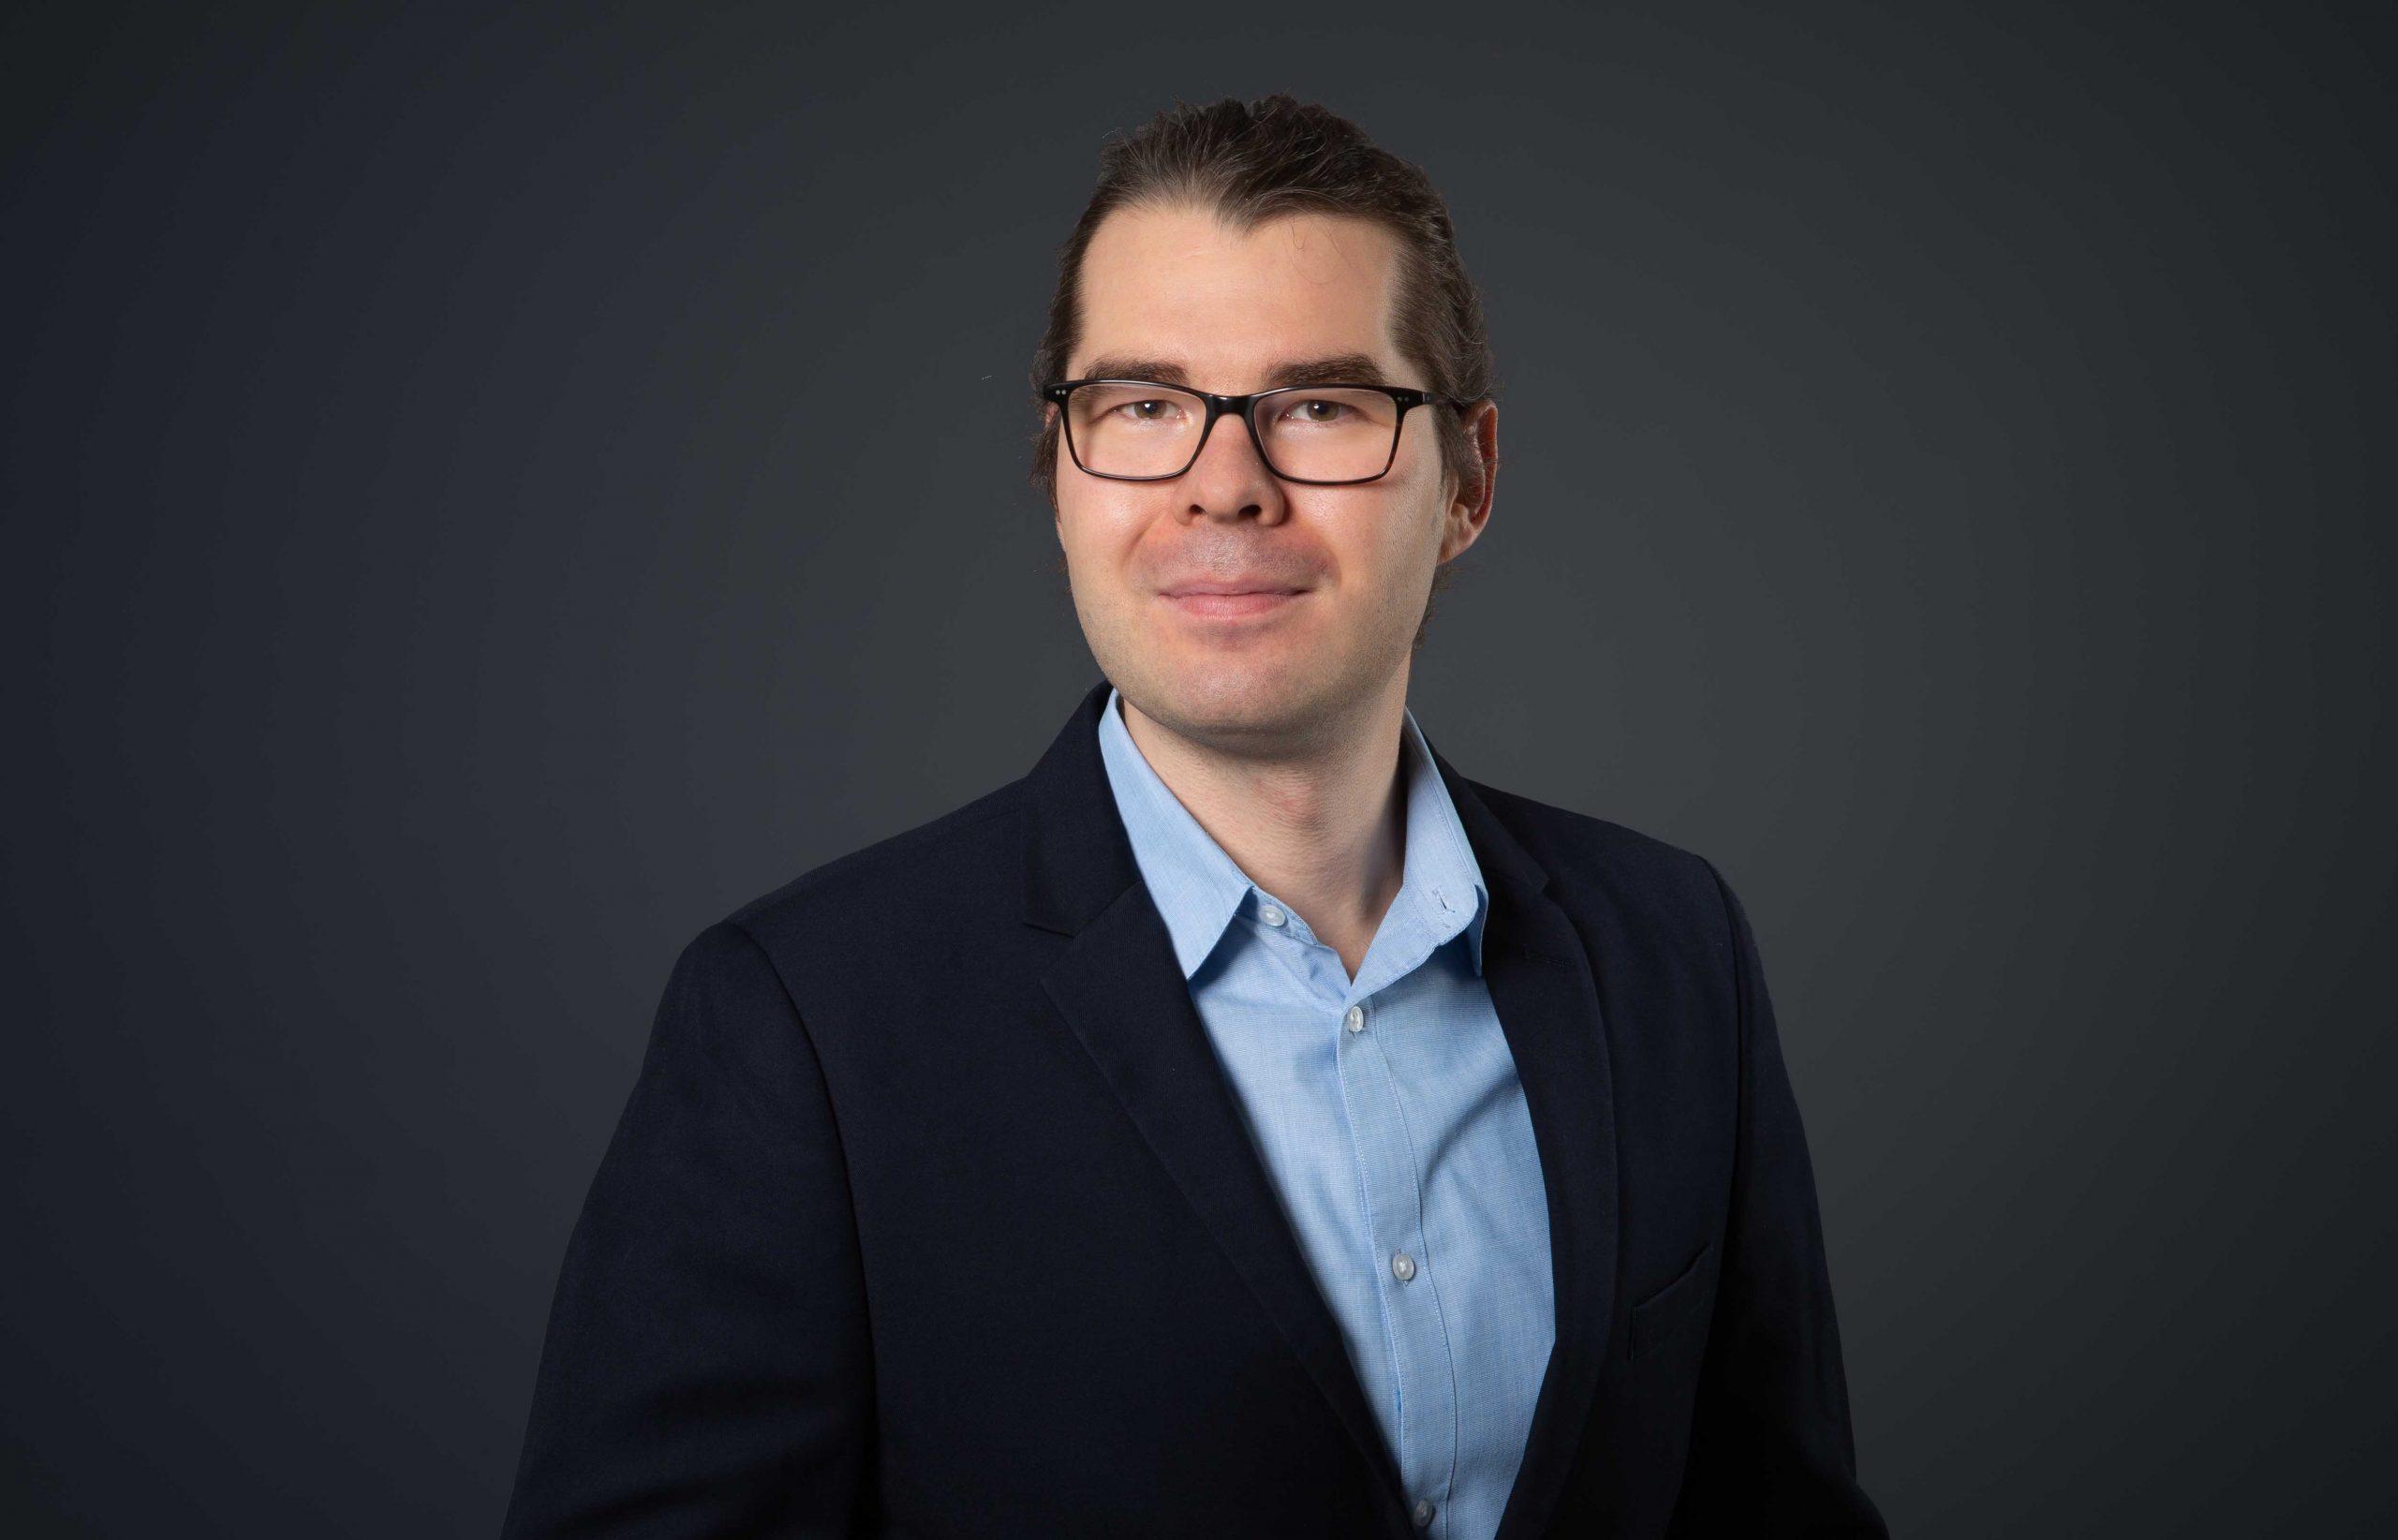 Jahn Hoffmann